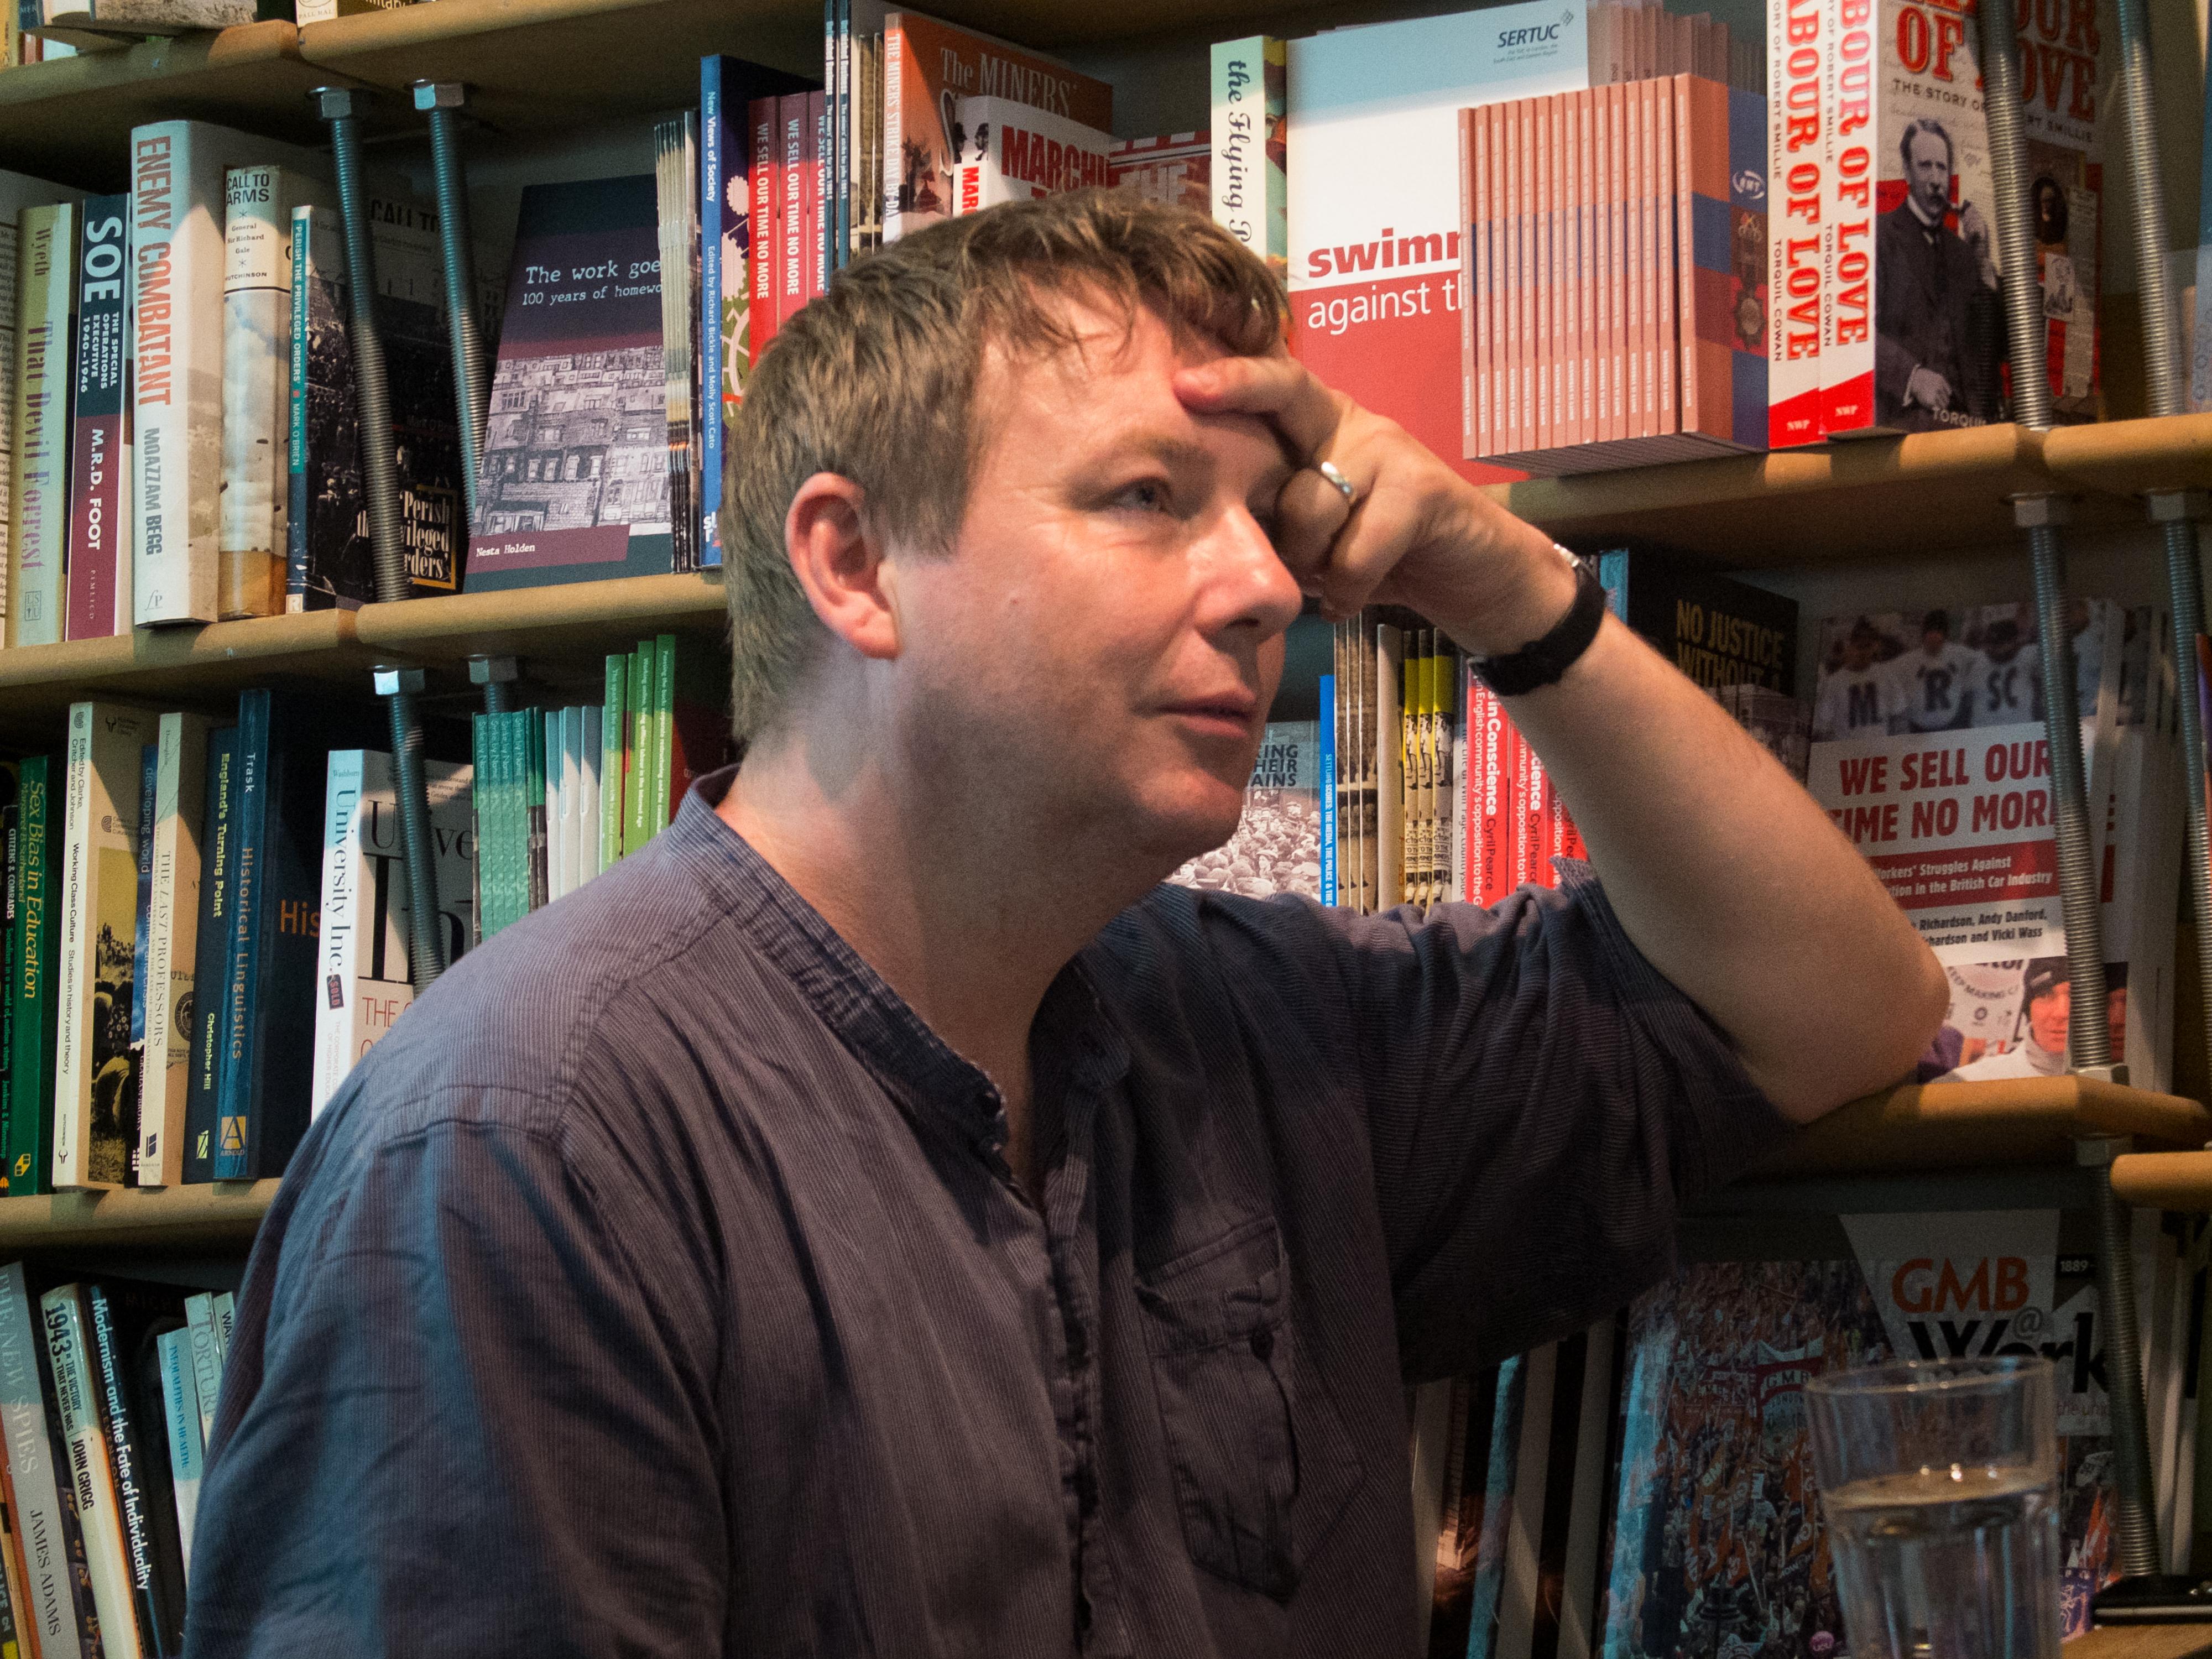 Dorling at Bookmarks bookshop, [[Bloomsbury]] in 2014